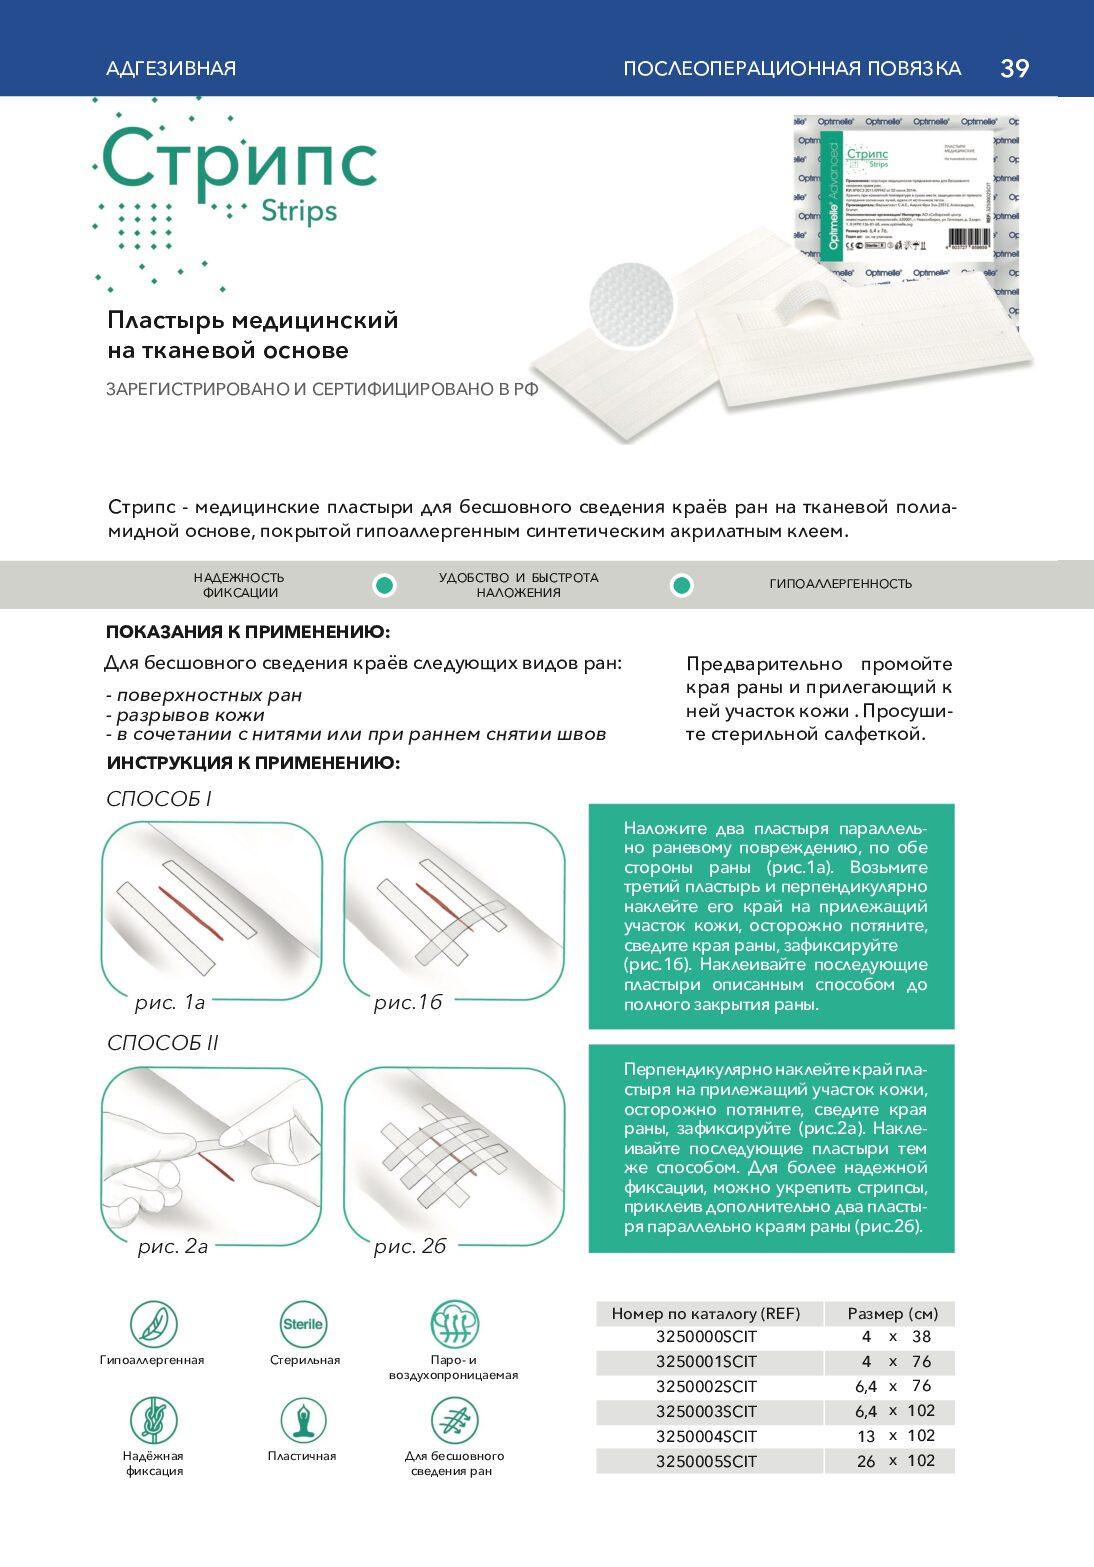 продукции Optimelle2 1 60 39 pdf